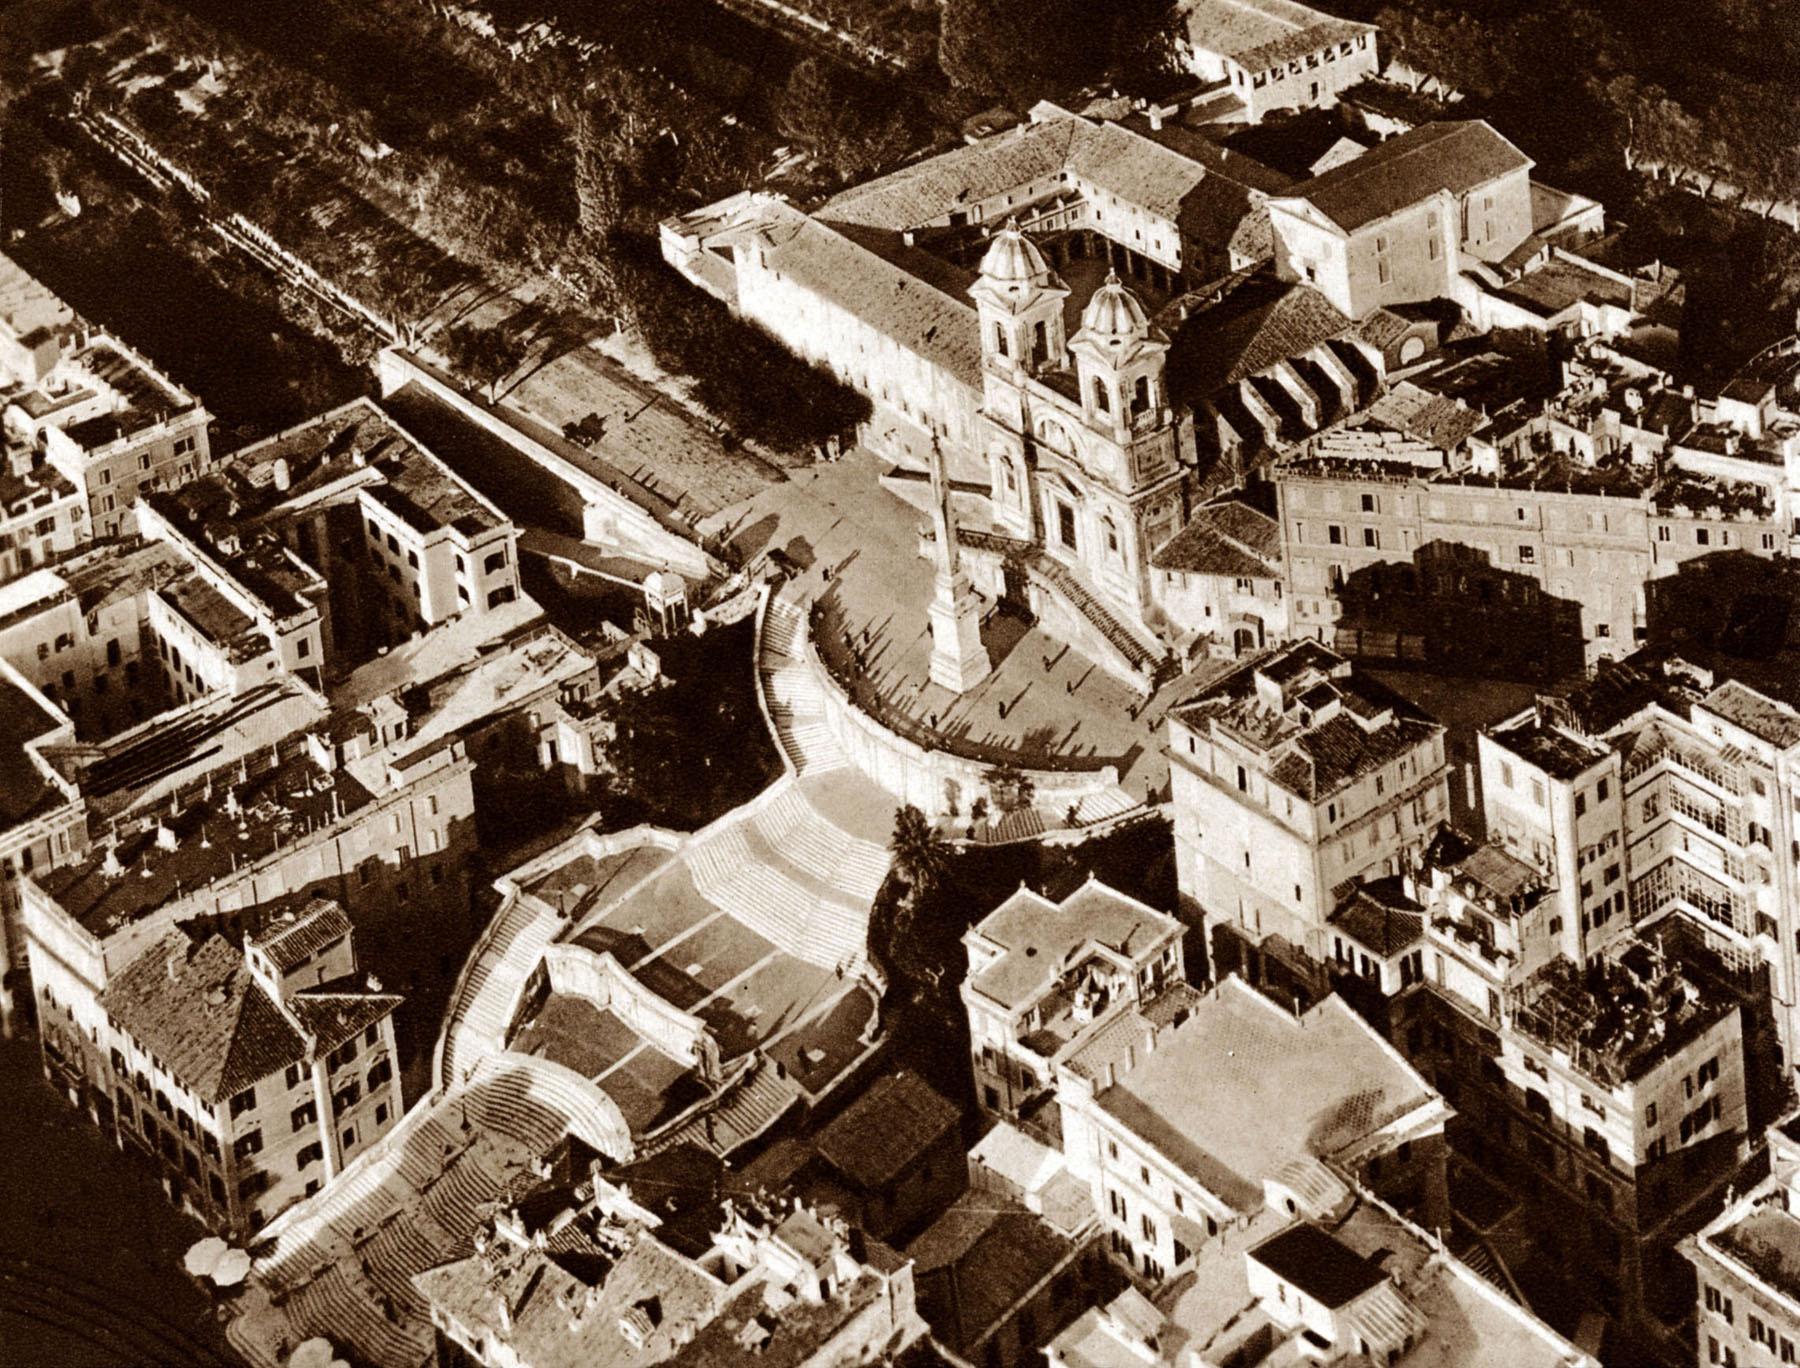 Légifotó 1938-ból (Forrás: www.it.wikipedia.org/wiki/File:Trinitamonti36.jpg)